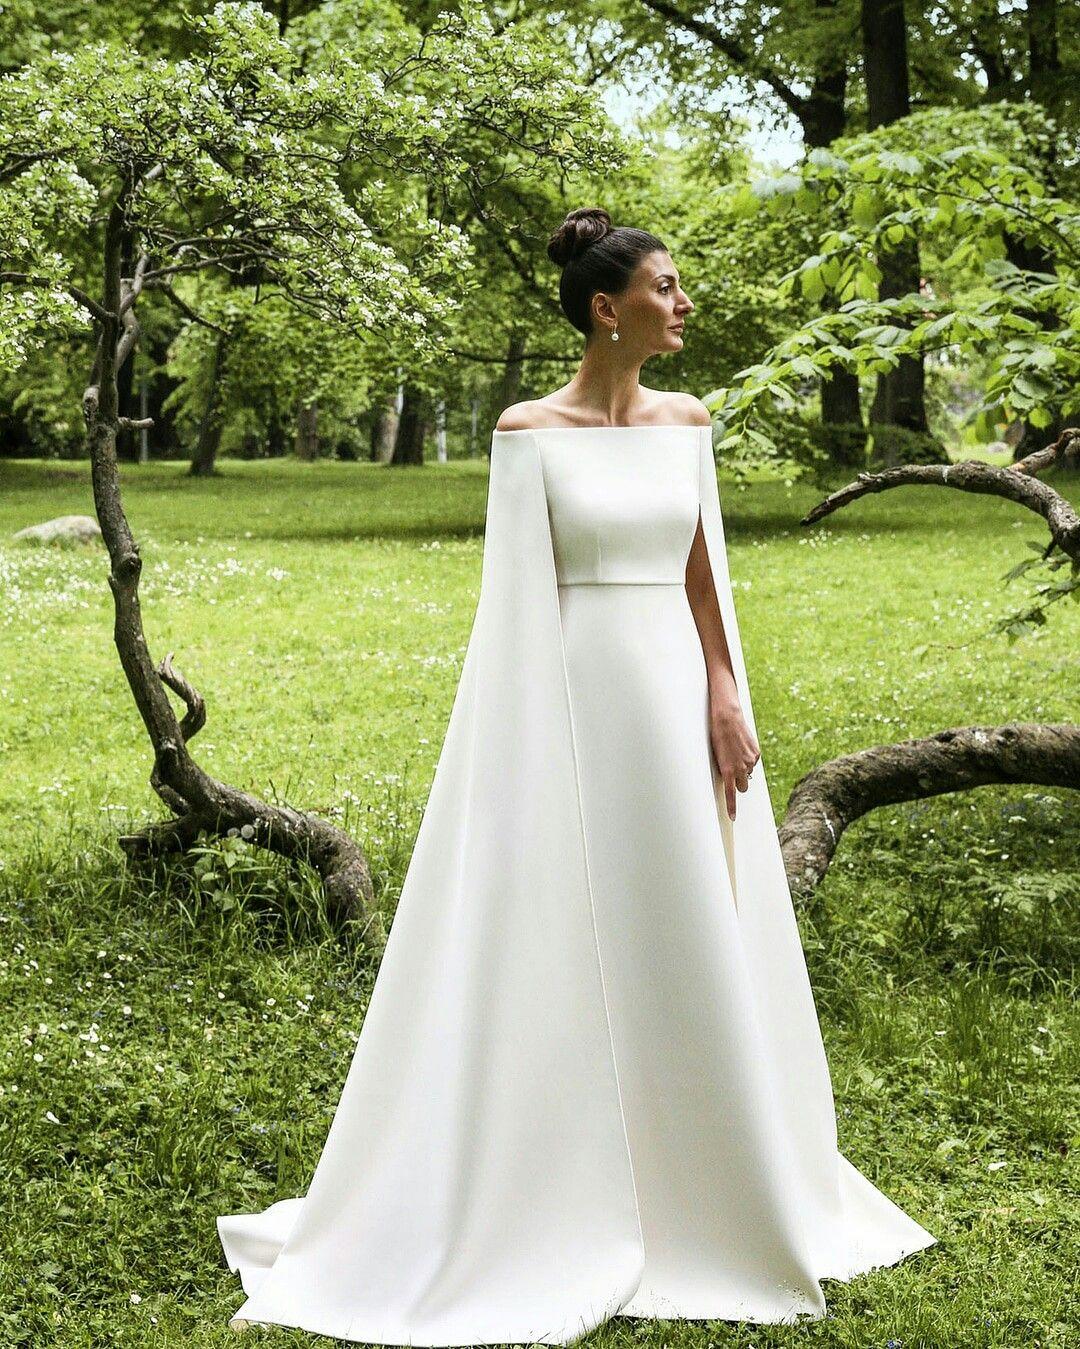 32190a2da Pin de Adriana Valentina Alvarez Parababi en Vestidos de novia en ...